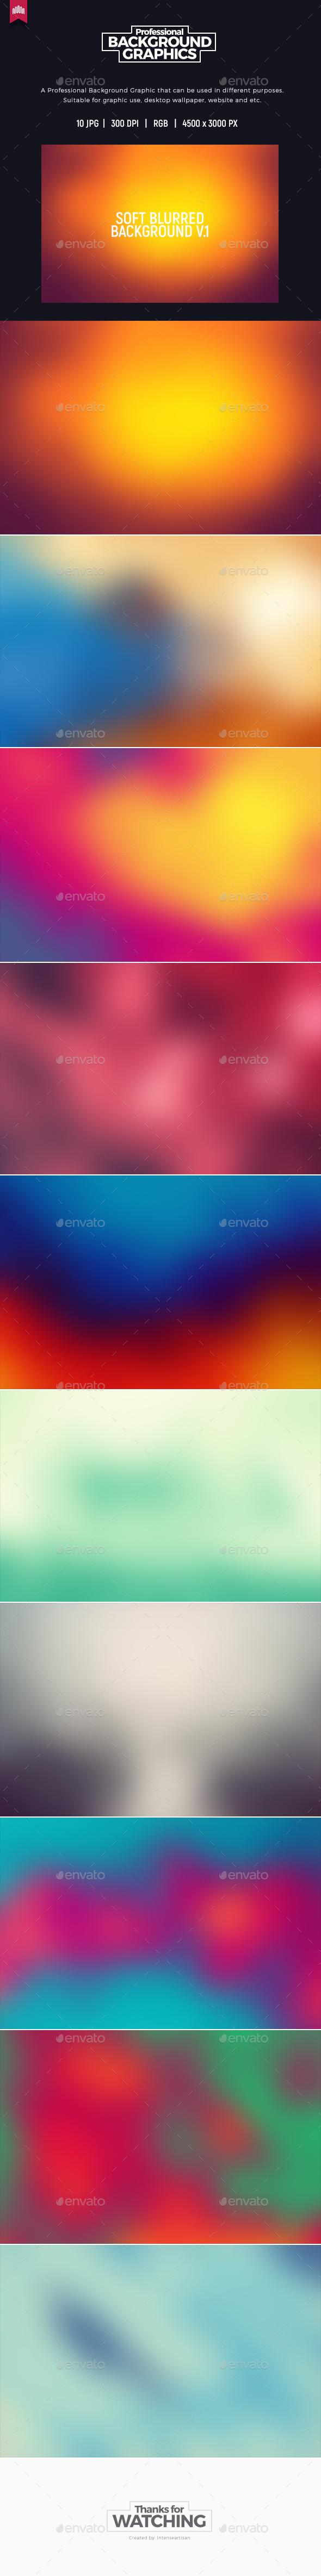 GraphicRiver Soft Blurred V.1 Background 20245231